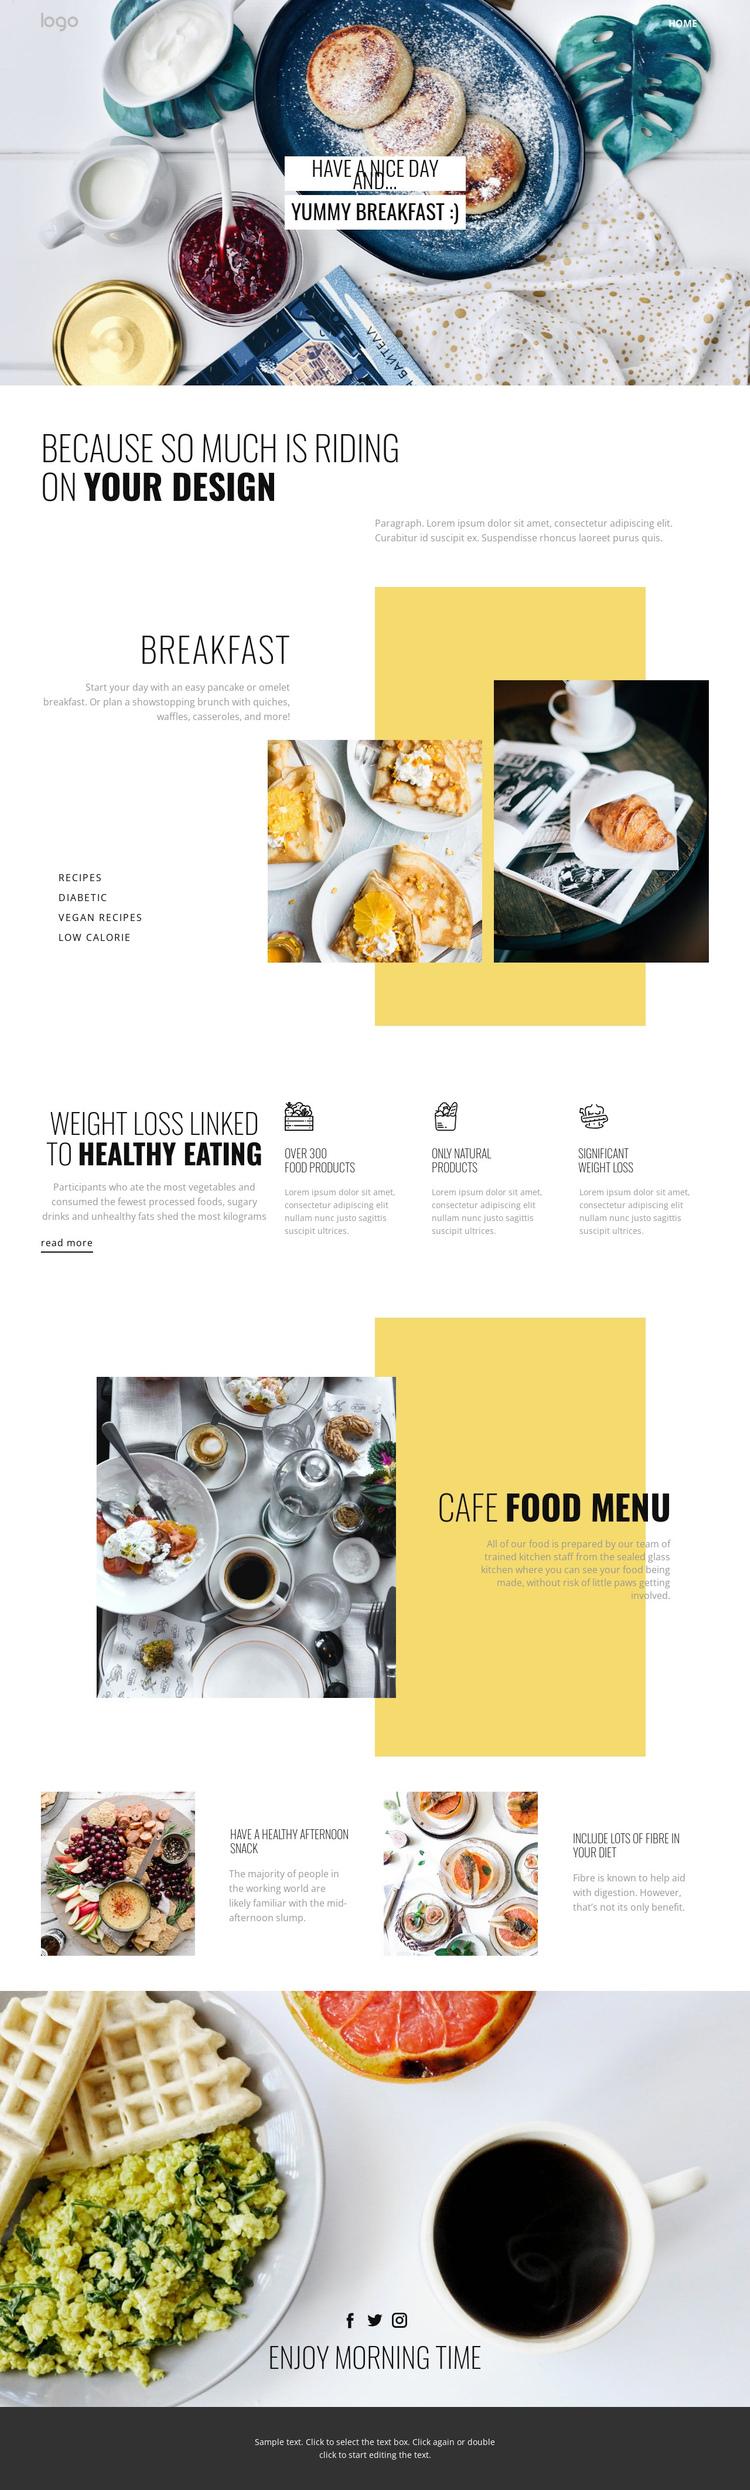 Healthy way of eating food Website Builder Software